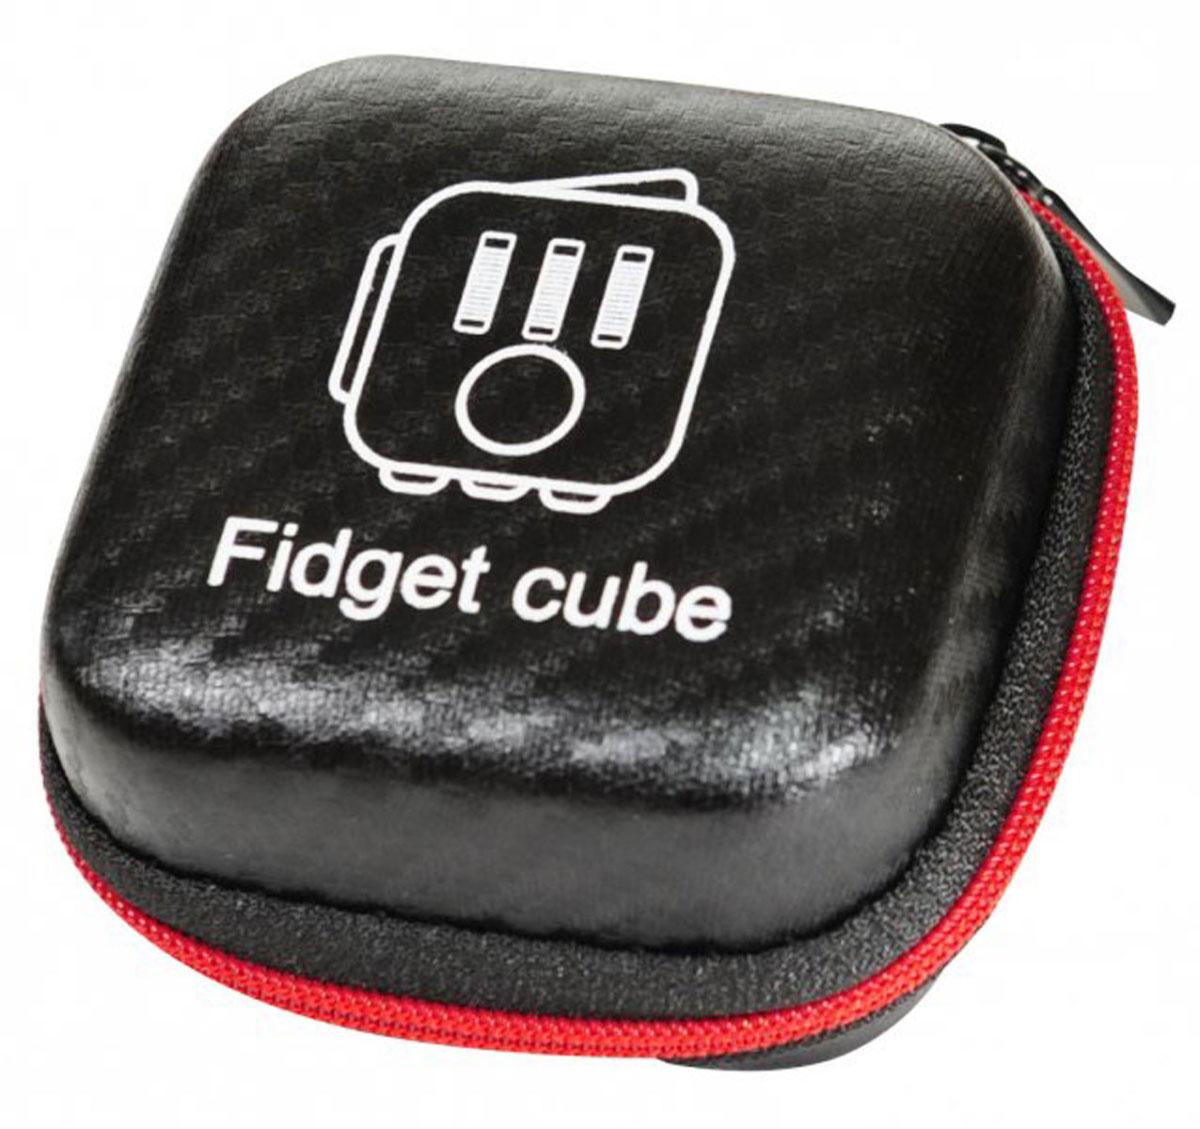 Fidget Cube Футляр для игрушки-антистресс игрушка антистресс fidget cube белый 6125